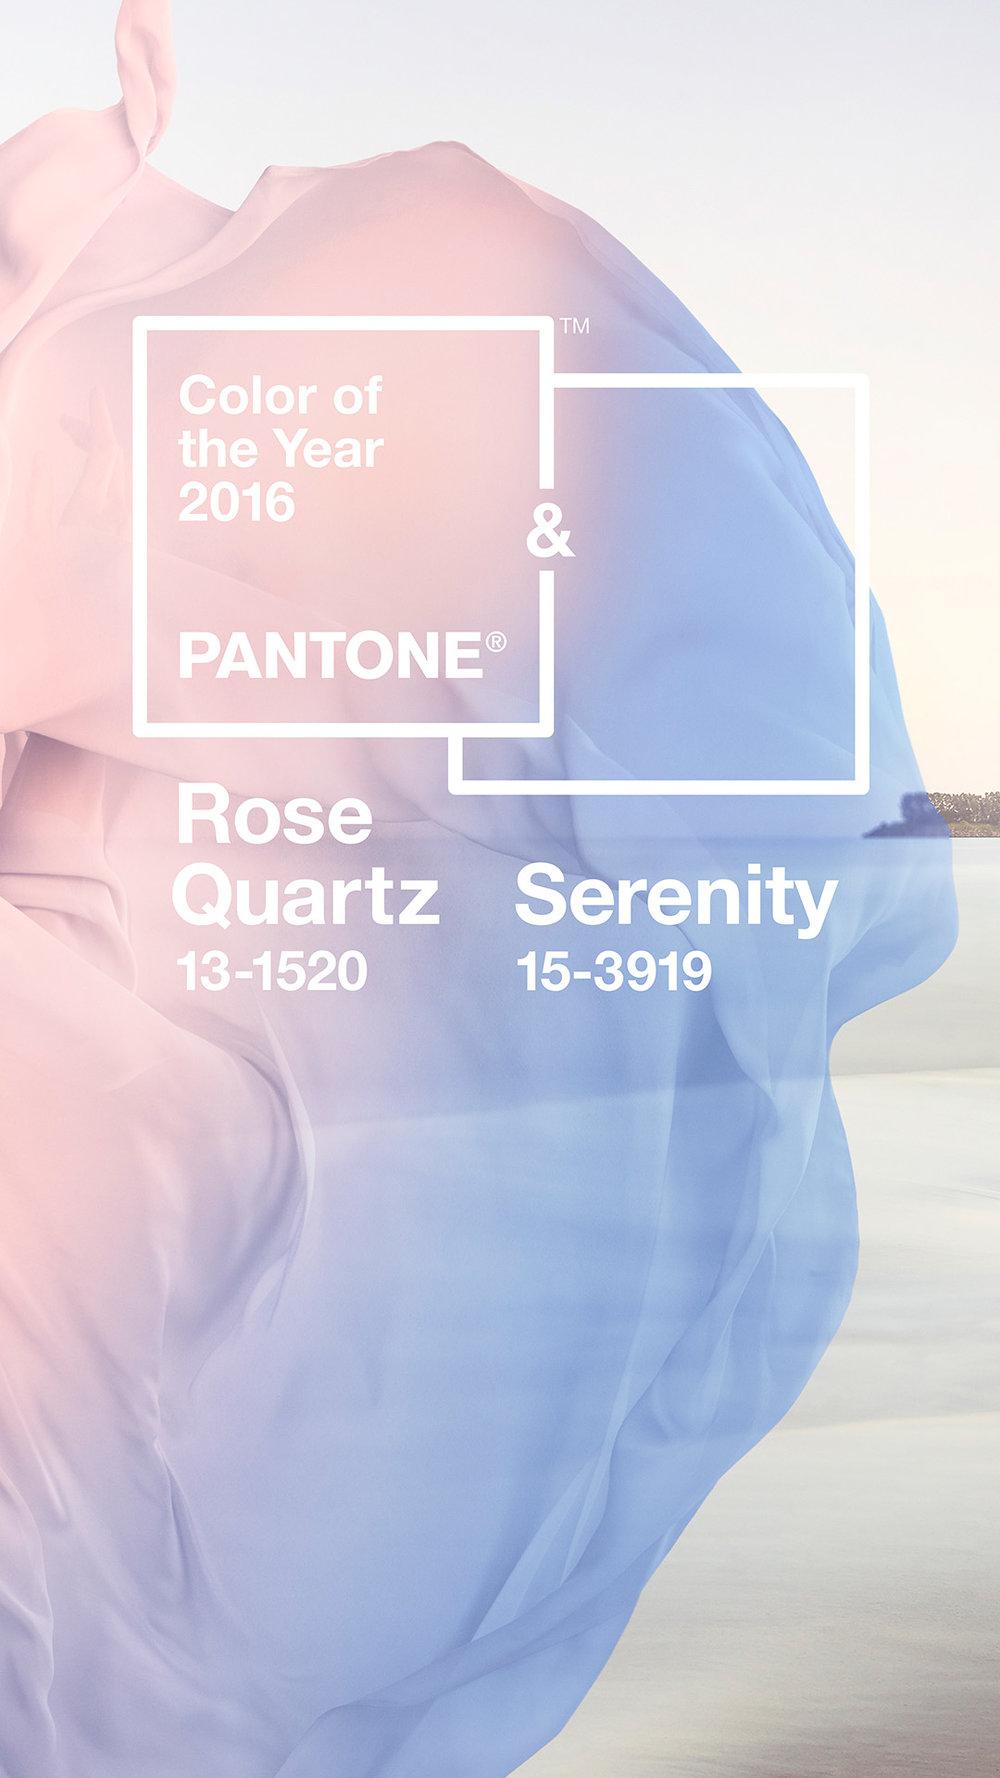 The Pantone Colors of the Year 2016: Rose Quartz & Serenity.